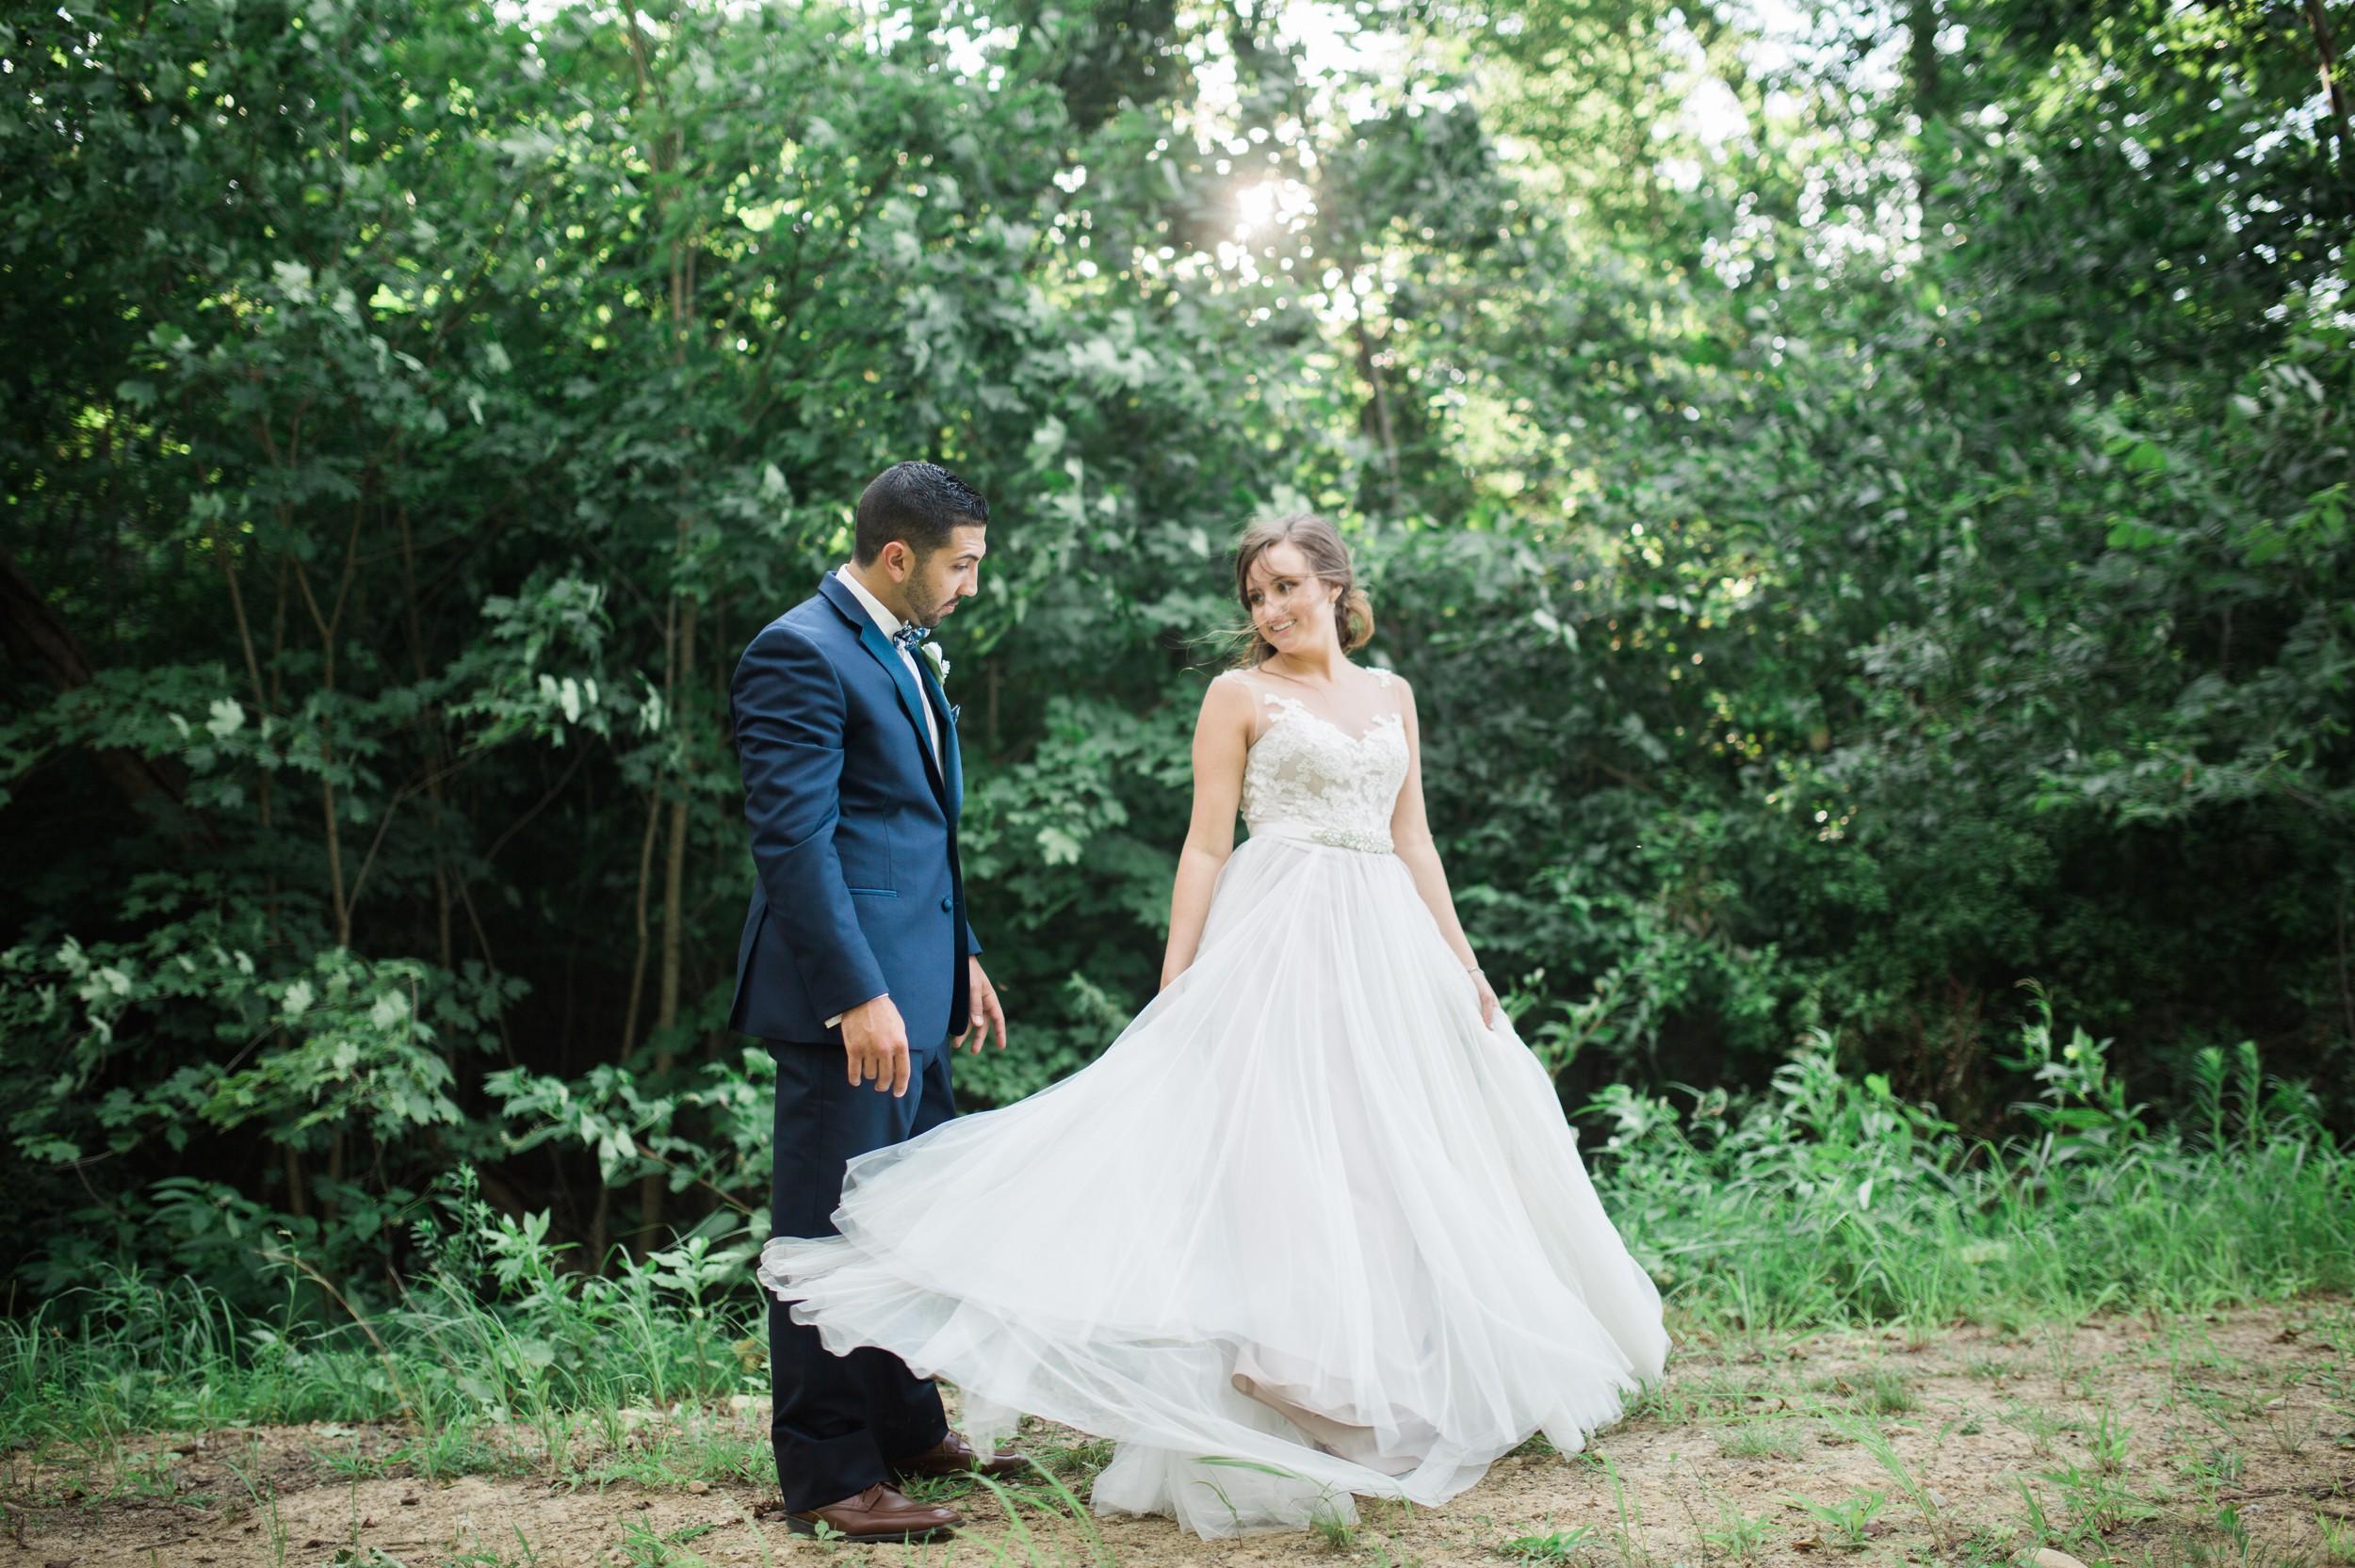 Nick-and-martina-pinelake-vinyards-wedding-columbiana-ohio-tracylynn-photography 23.jpg